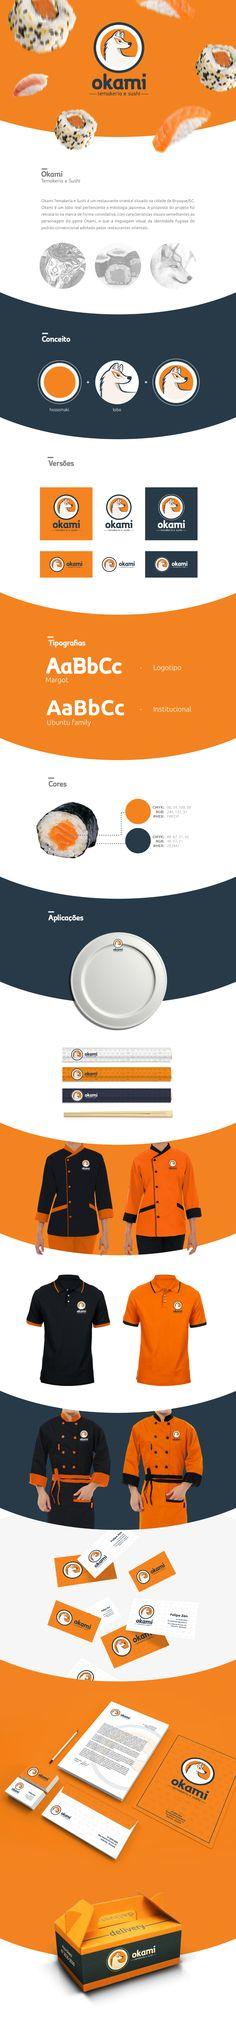 Okami Temakeria e Sushi   Identidade Visual on Behance Sushi, Behance, Logos, Visual Identity, Logo, Sushi Rolls